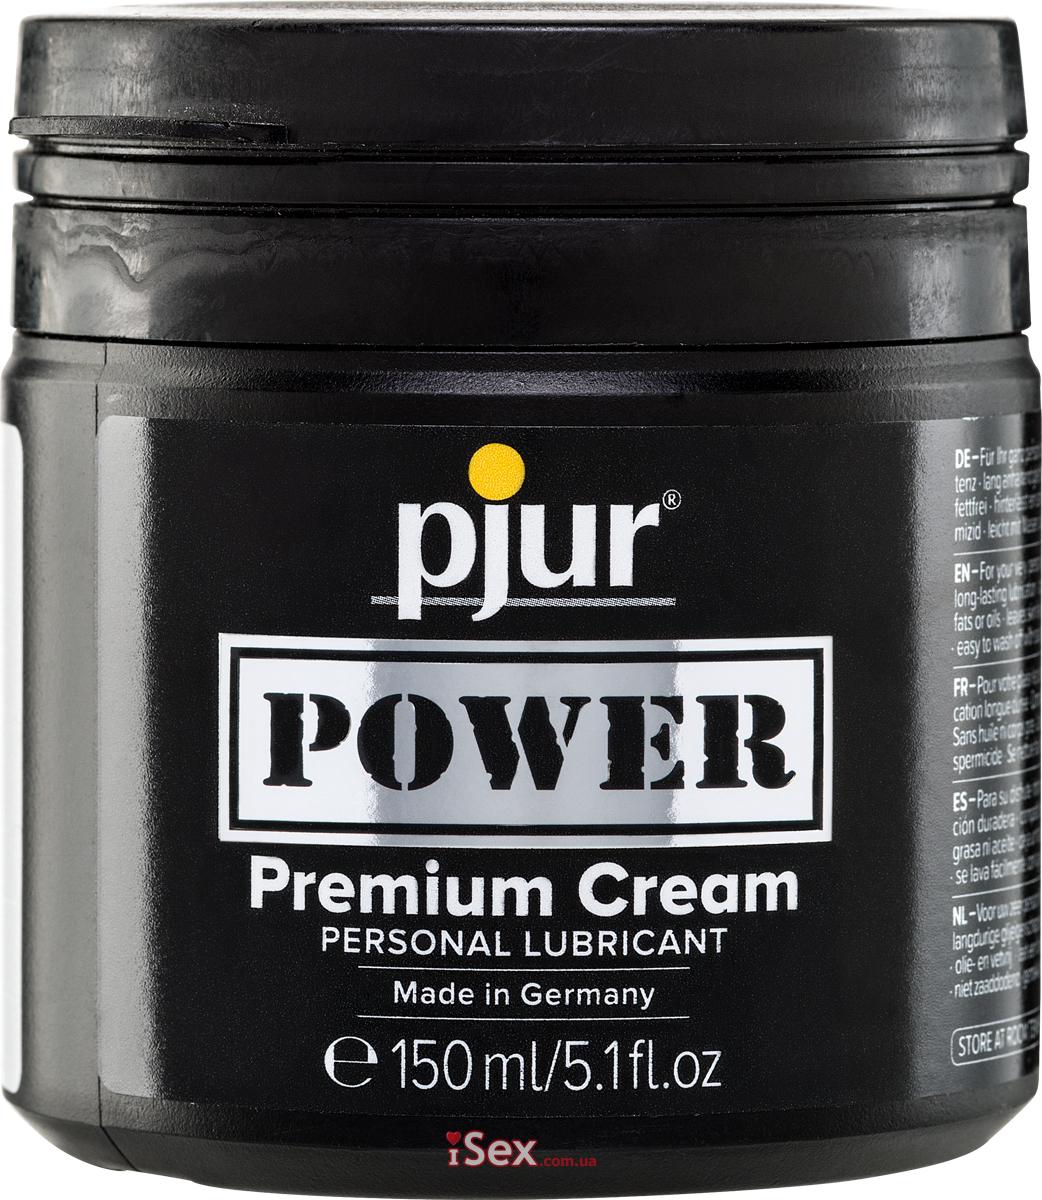 Крем-лубрикант для фистинга Pjur Power Premium Creme, 150 мл